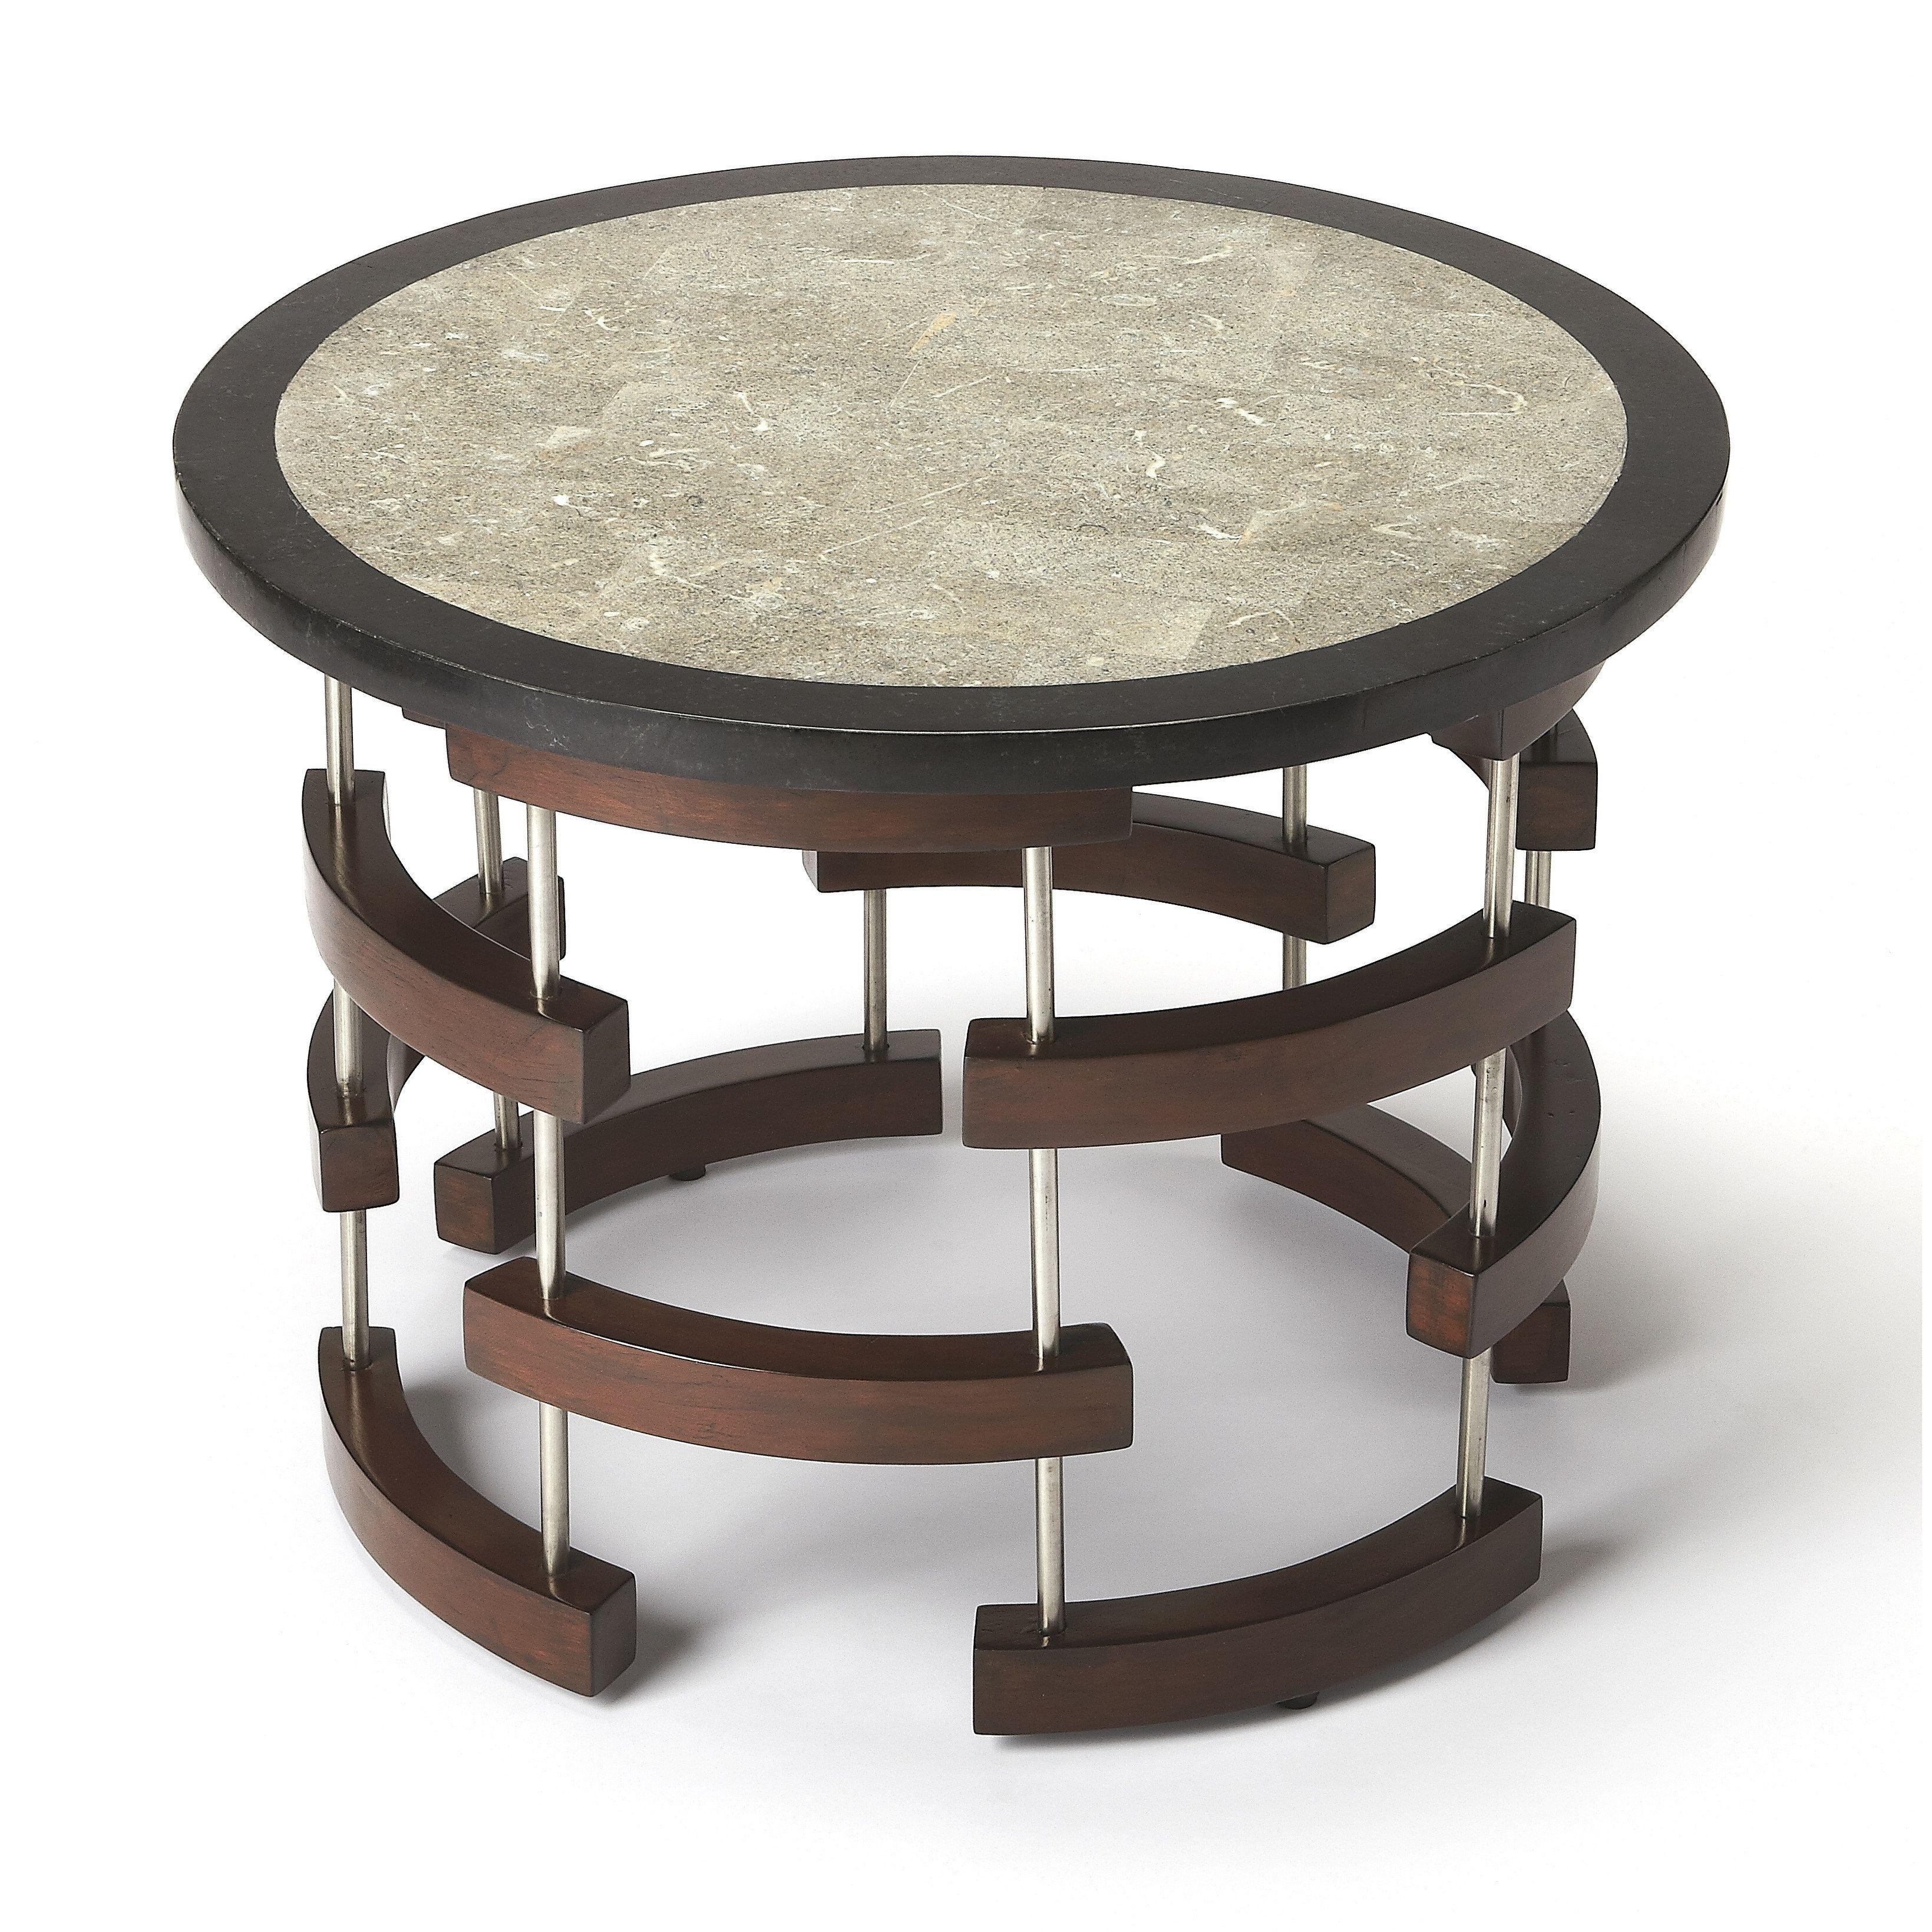 Butler Broken Arcs Fossil Stone Coffee Table Grey